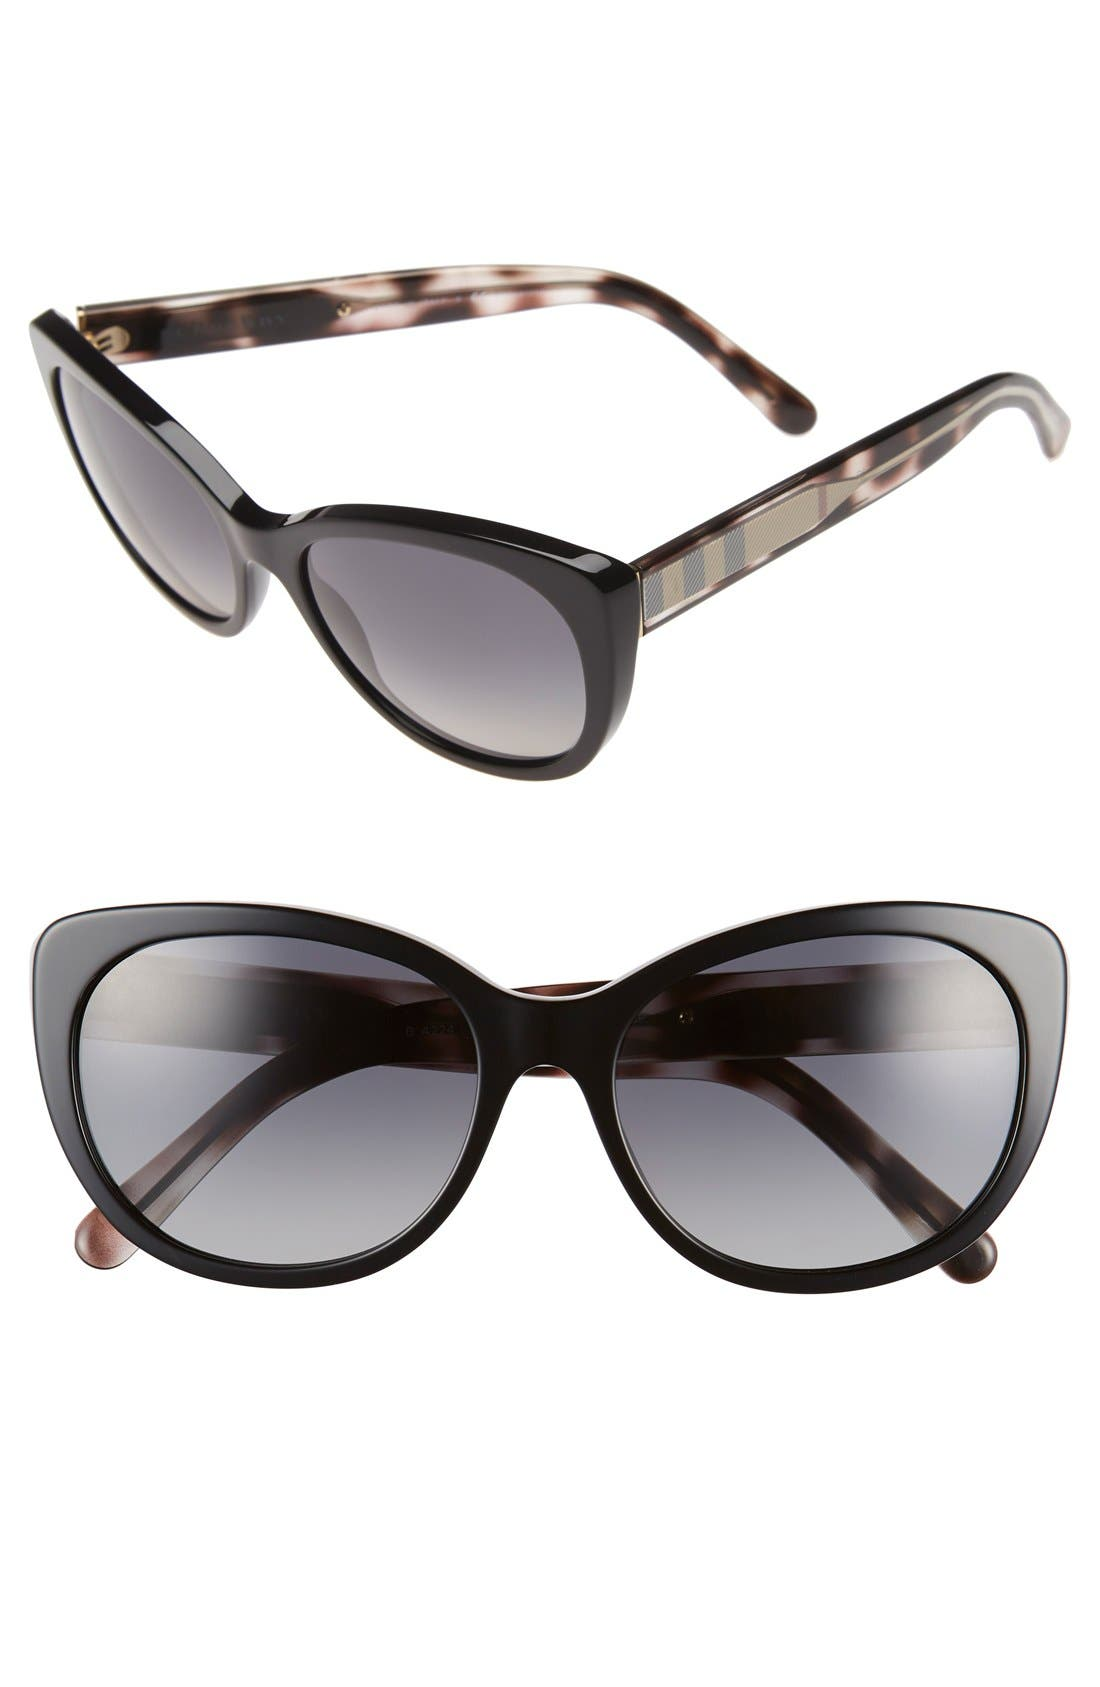 Main Image - Burberry 56mm Cat Eye Sunglasses